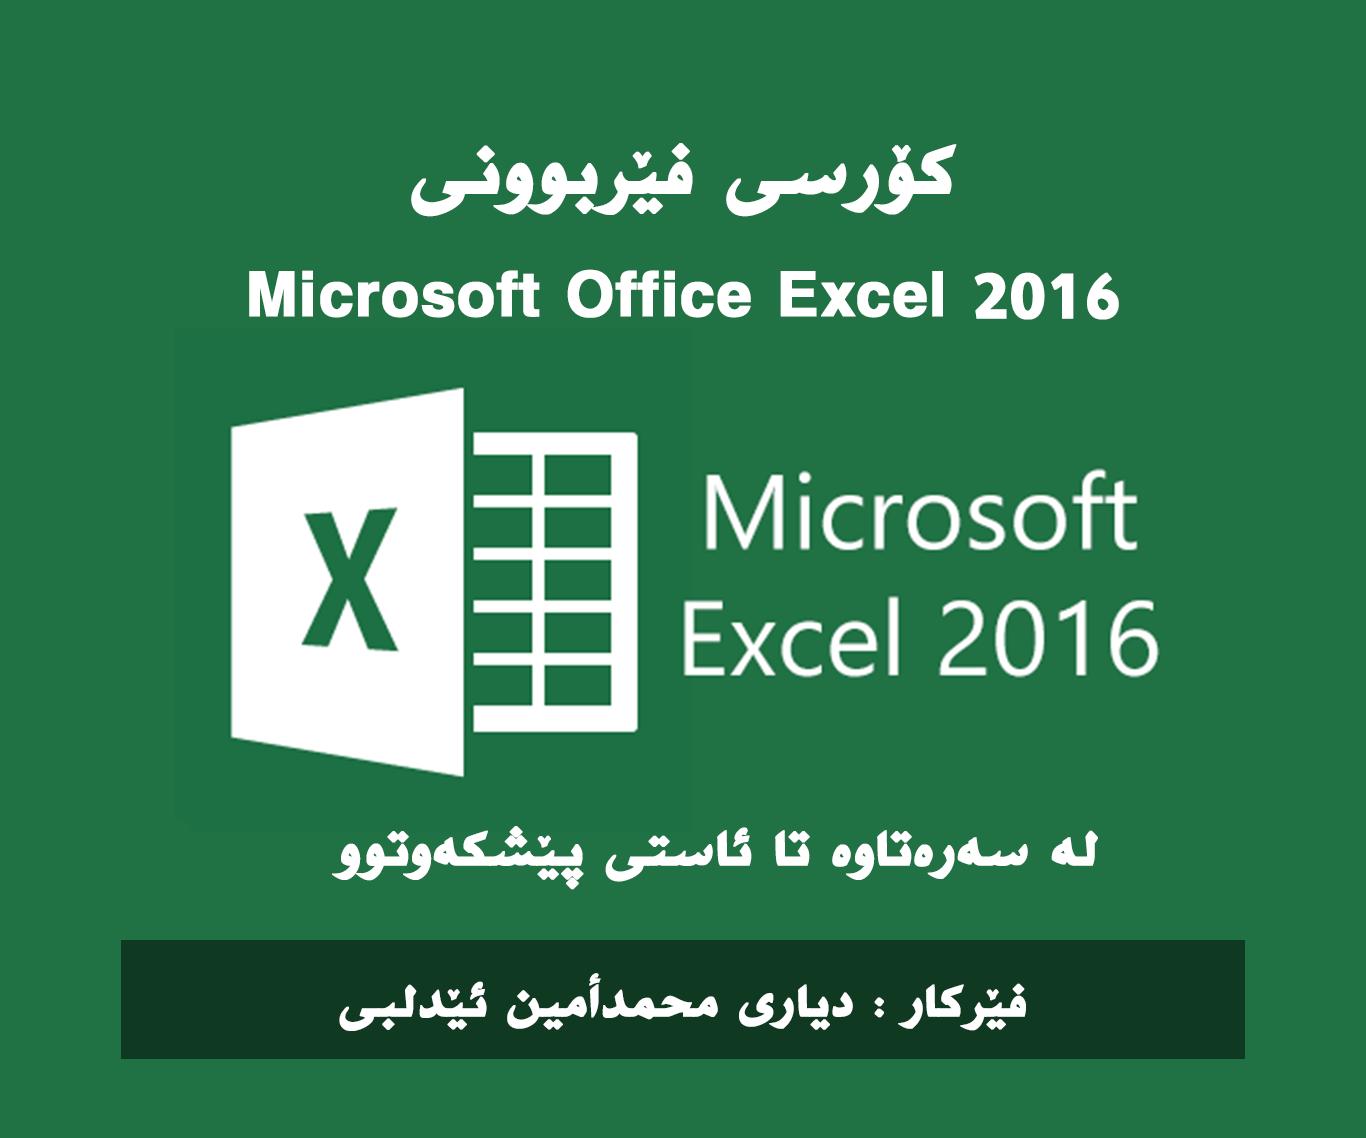 msexcel2016